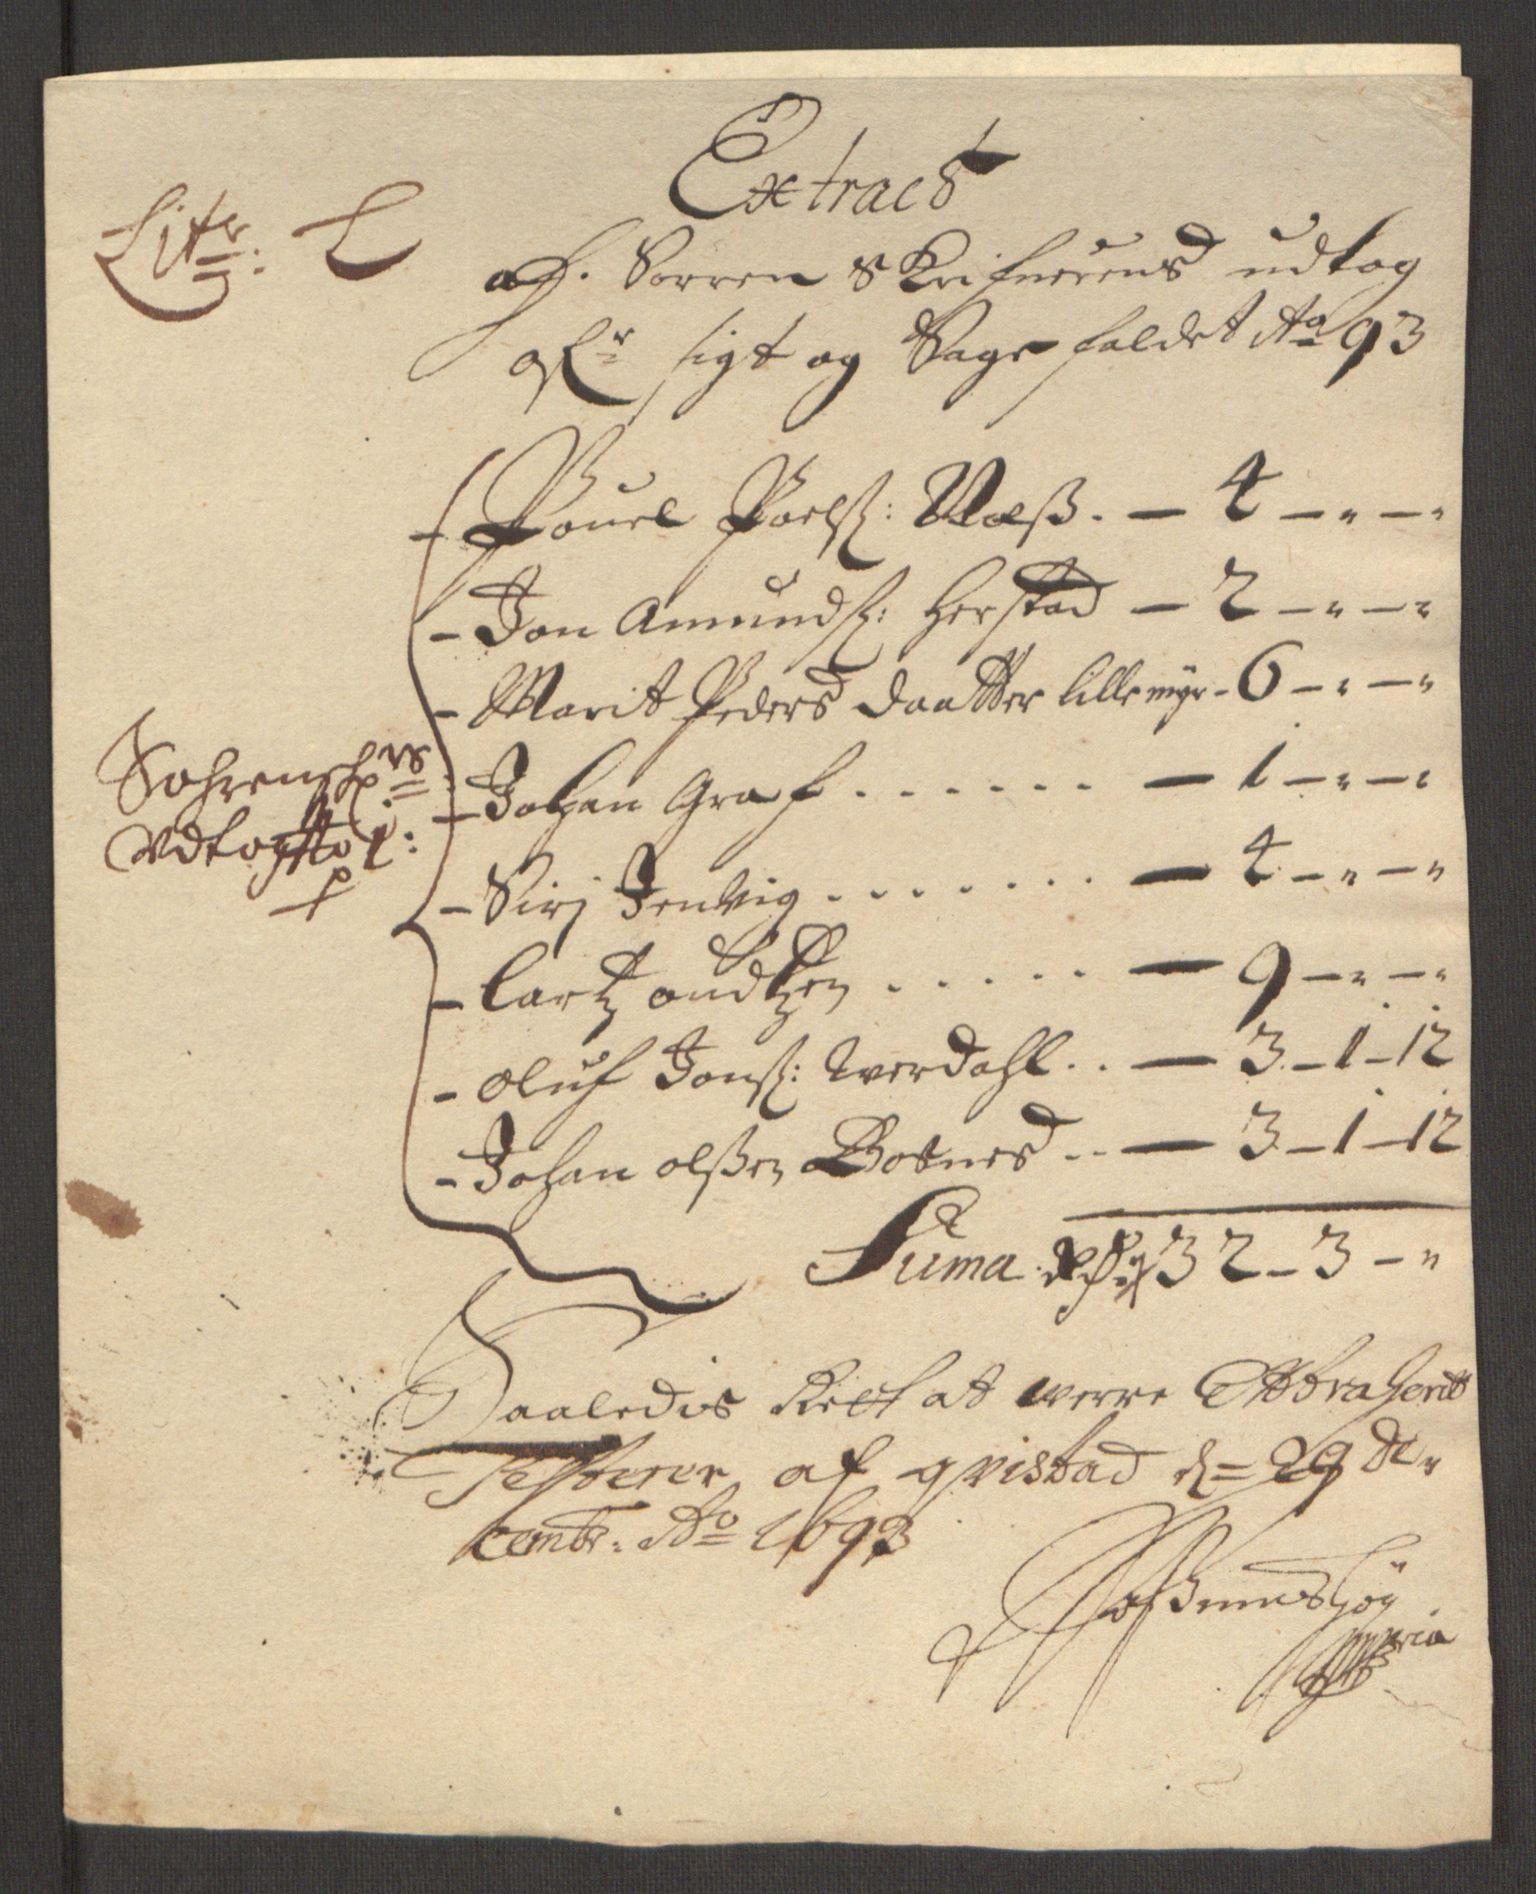 RA, Rentekammeret inntil 1814, Reviderte regnskaper, Fogderegnskap, R63/L4308: Fogderegnskap Inderøy, 1692-1694, s. 504